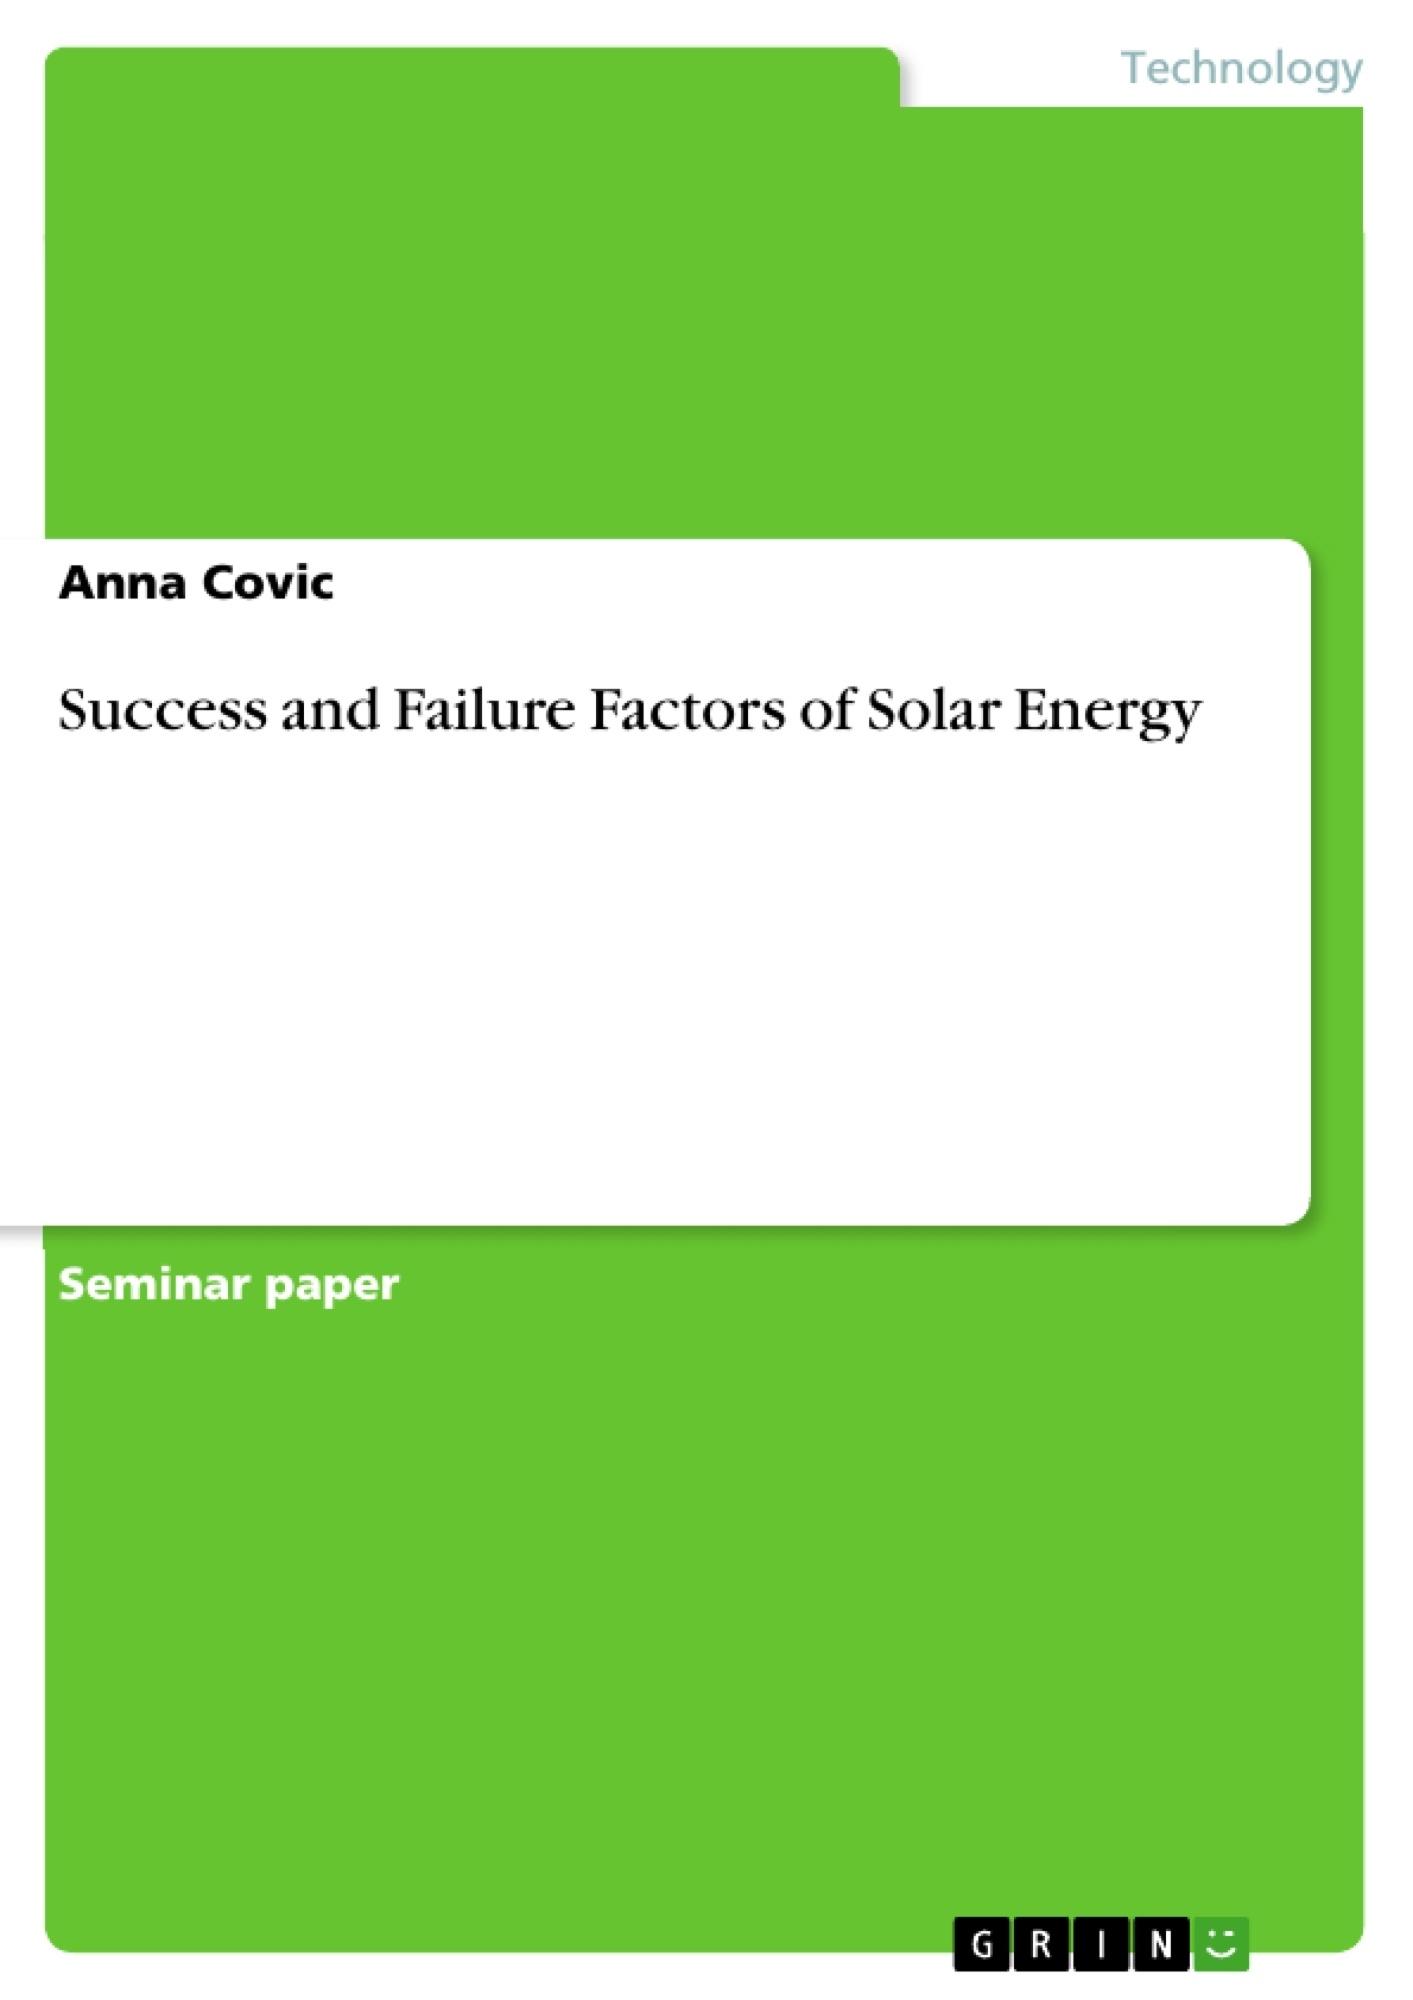 Title: Success and Failure Factors of Solar Energy